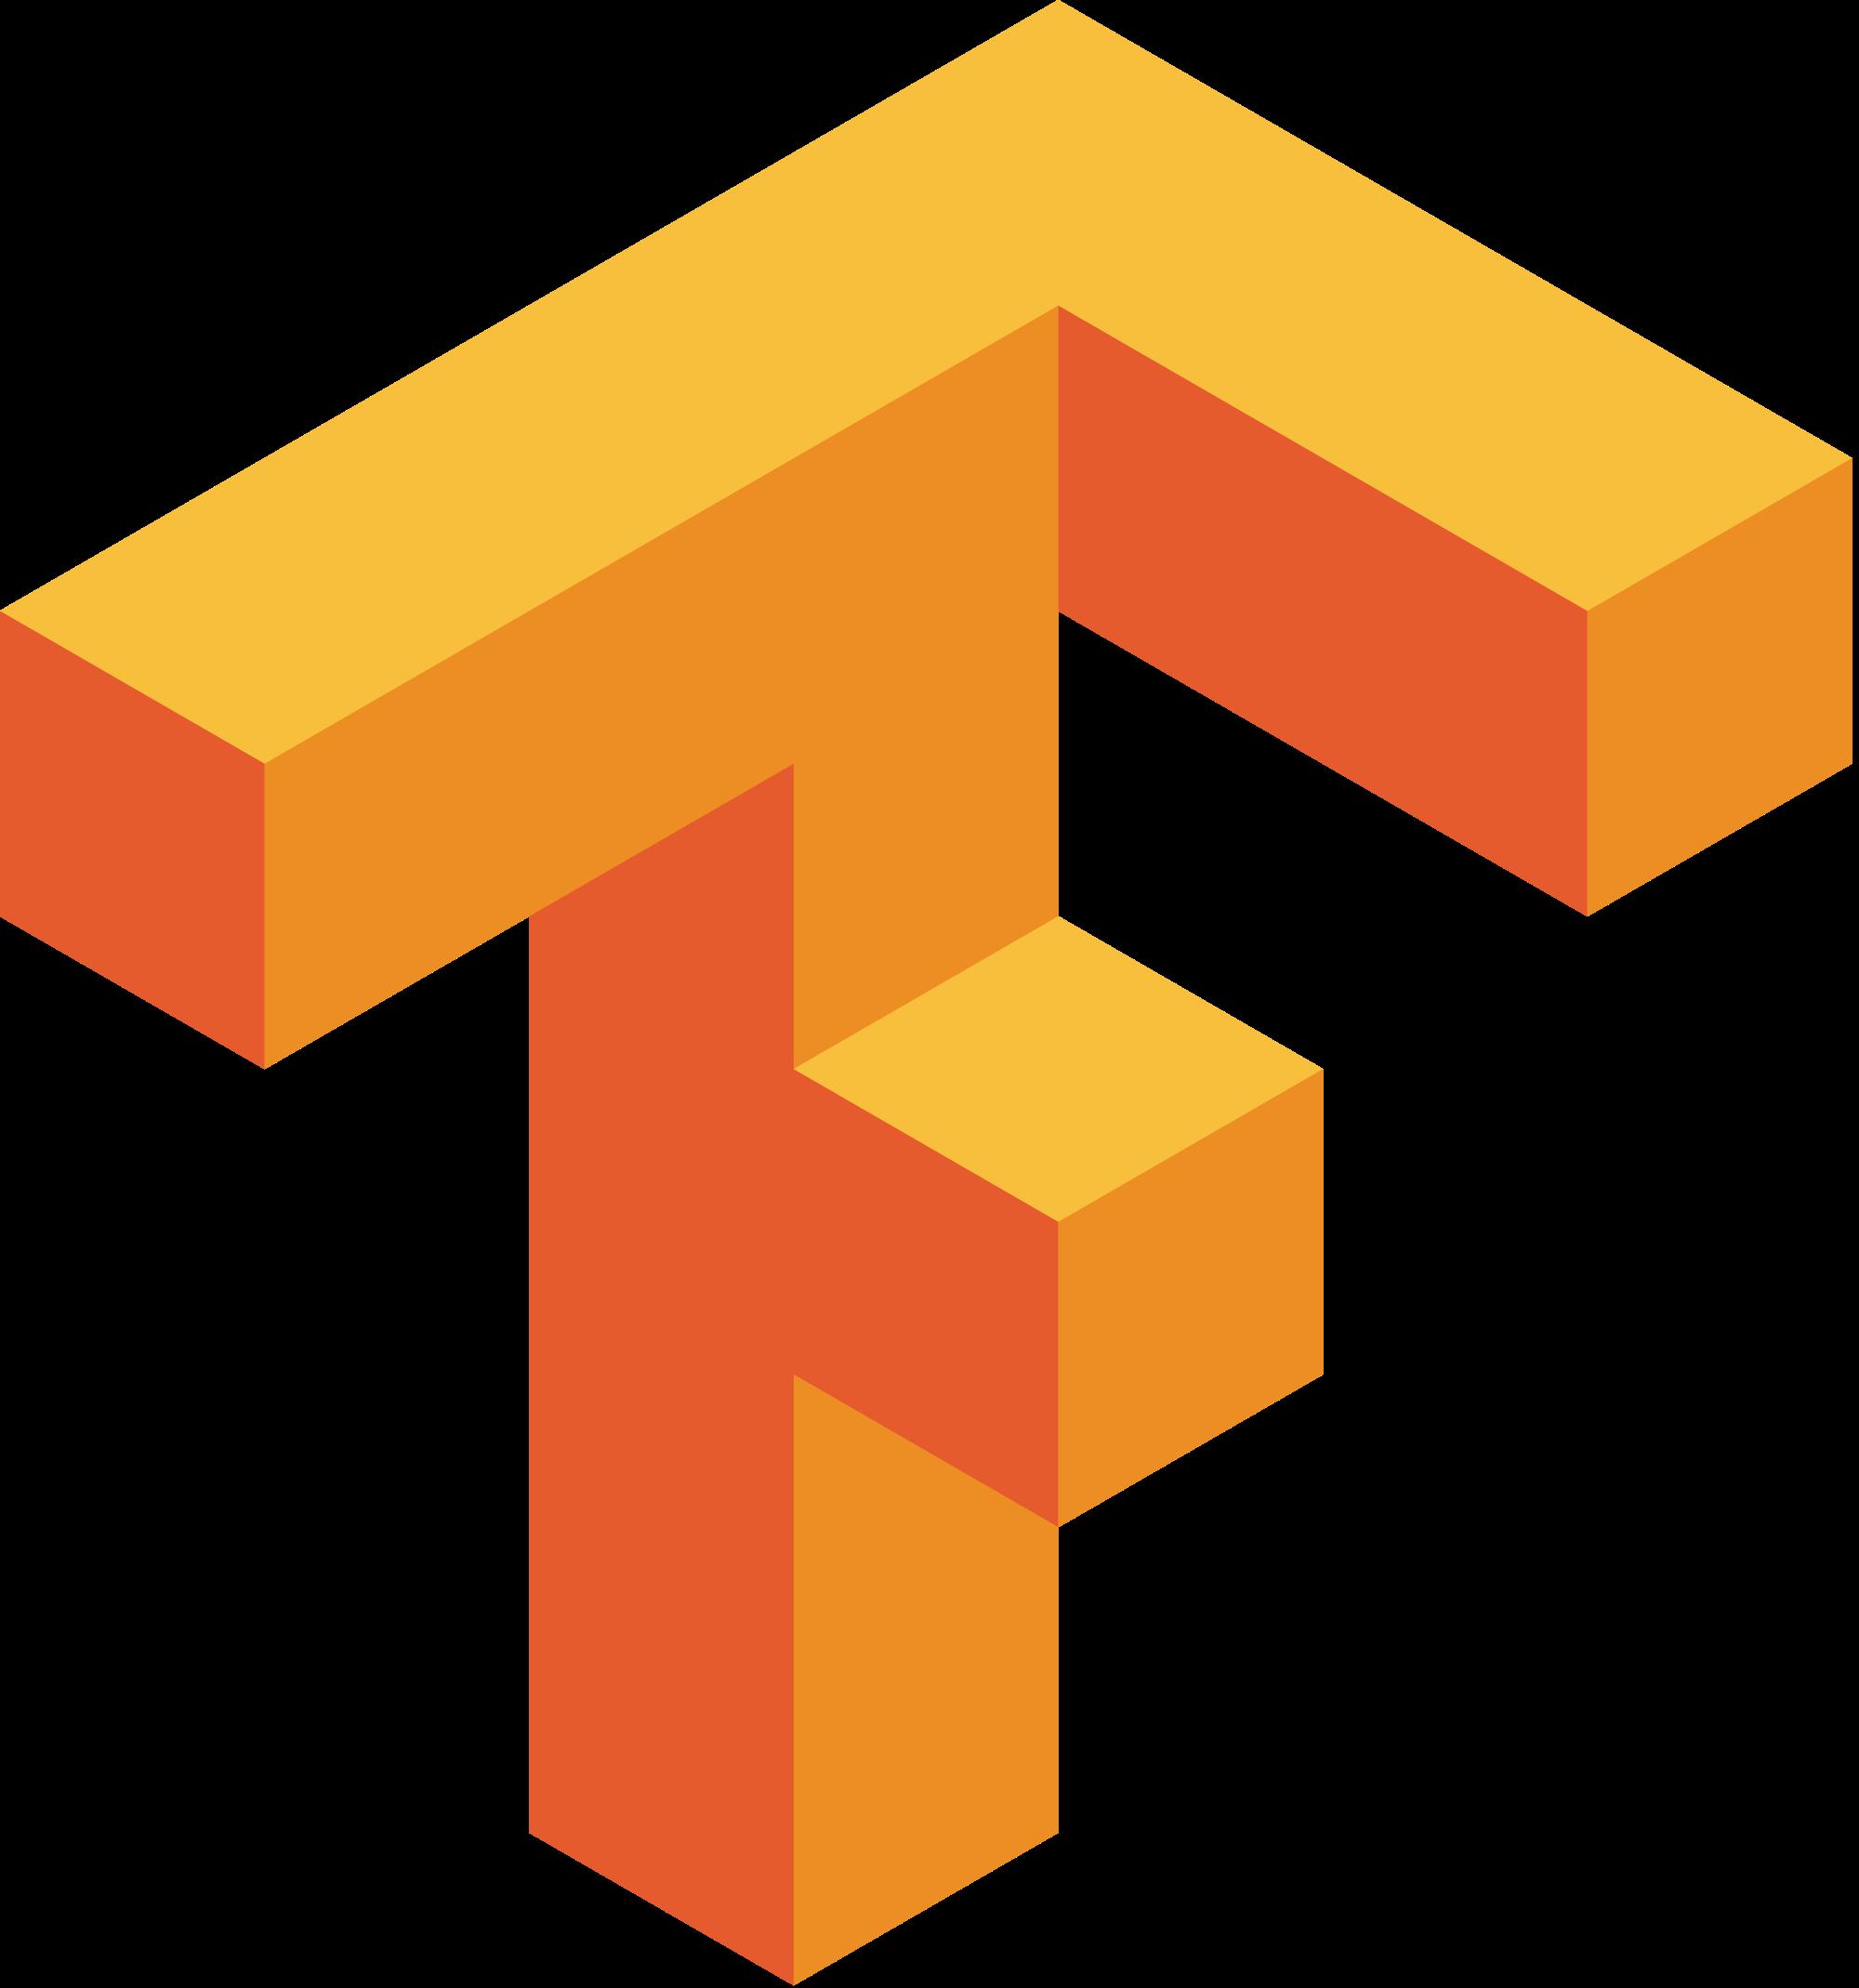 Tensorflow_logo.svg